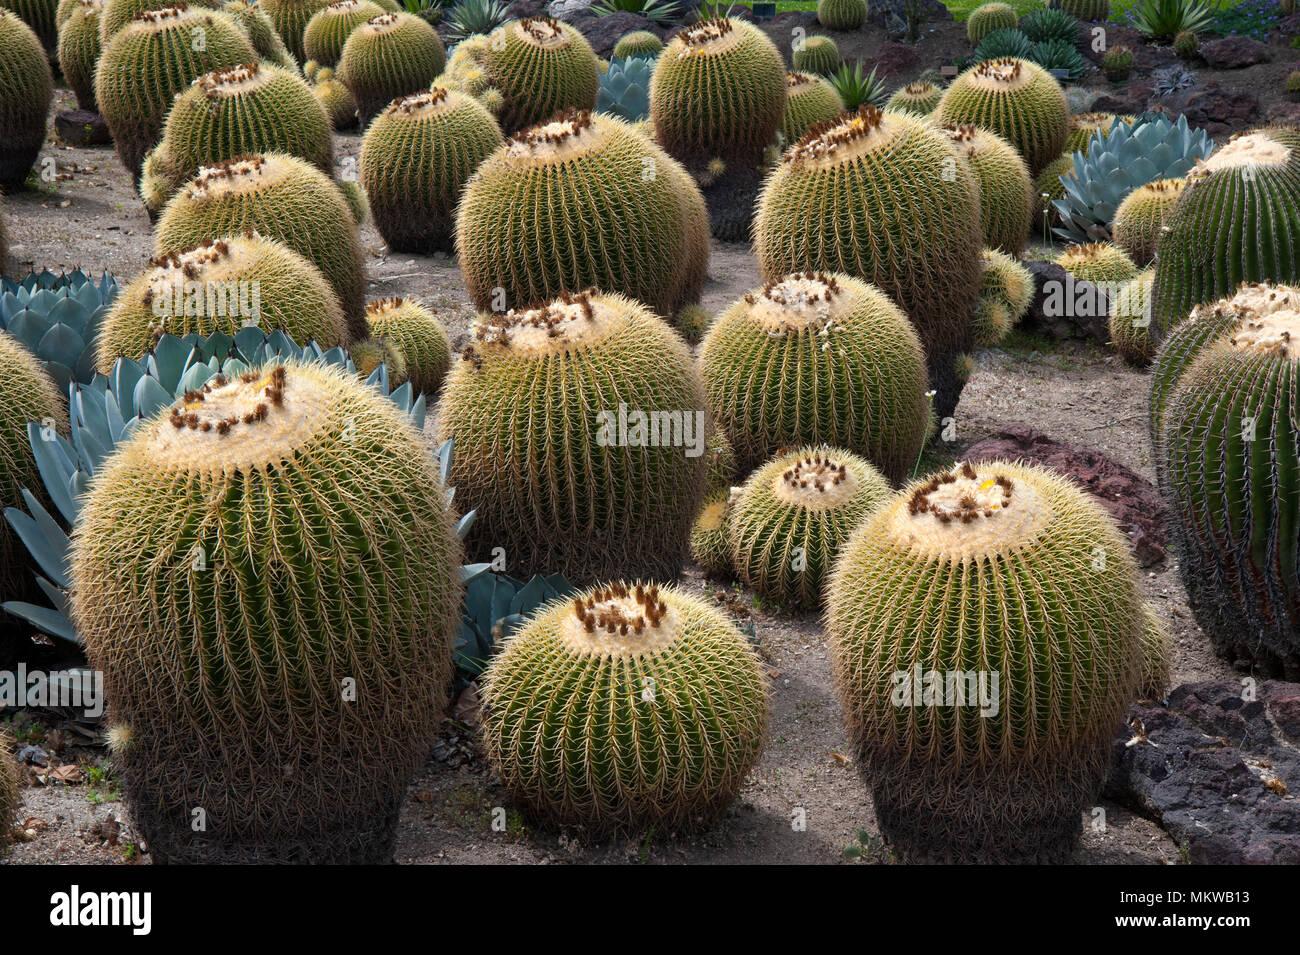 Cactus Garden display of Barrel Cactus at the Huntington Gardens in ...